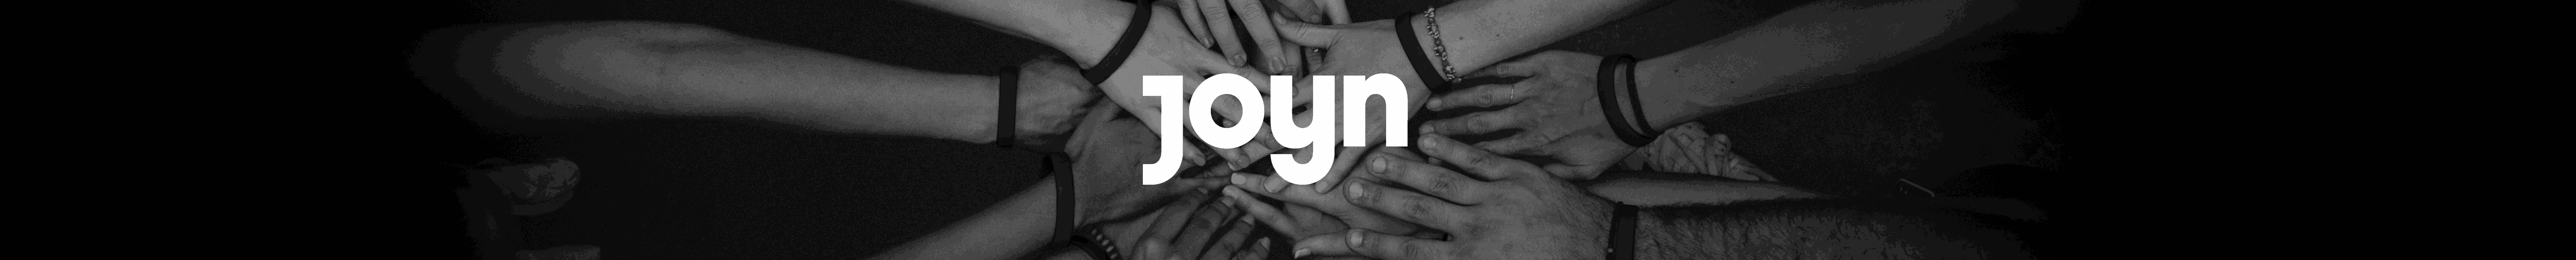 Joyn GmbH logo